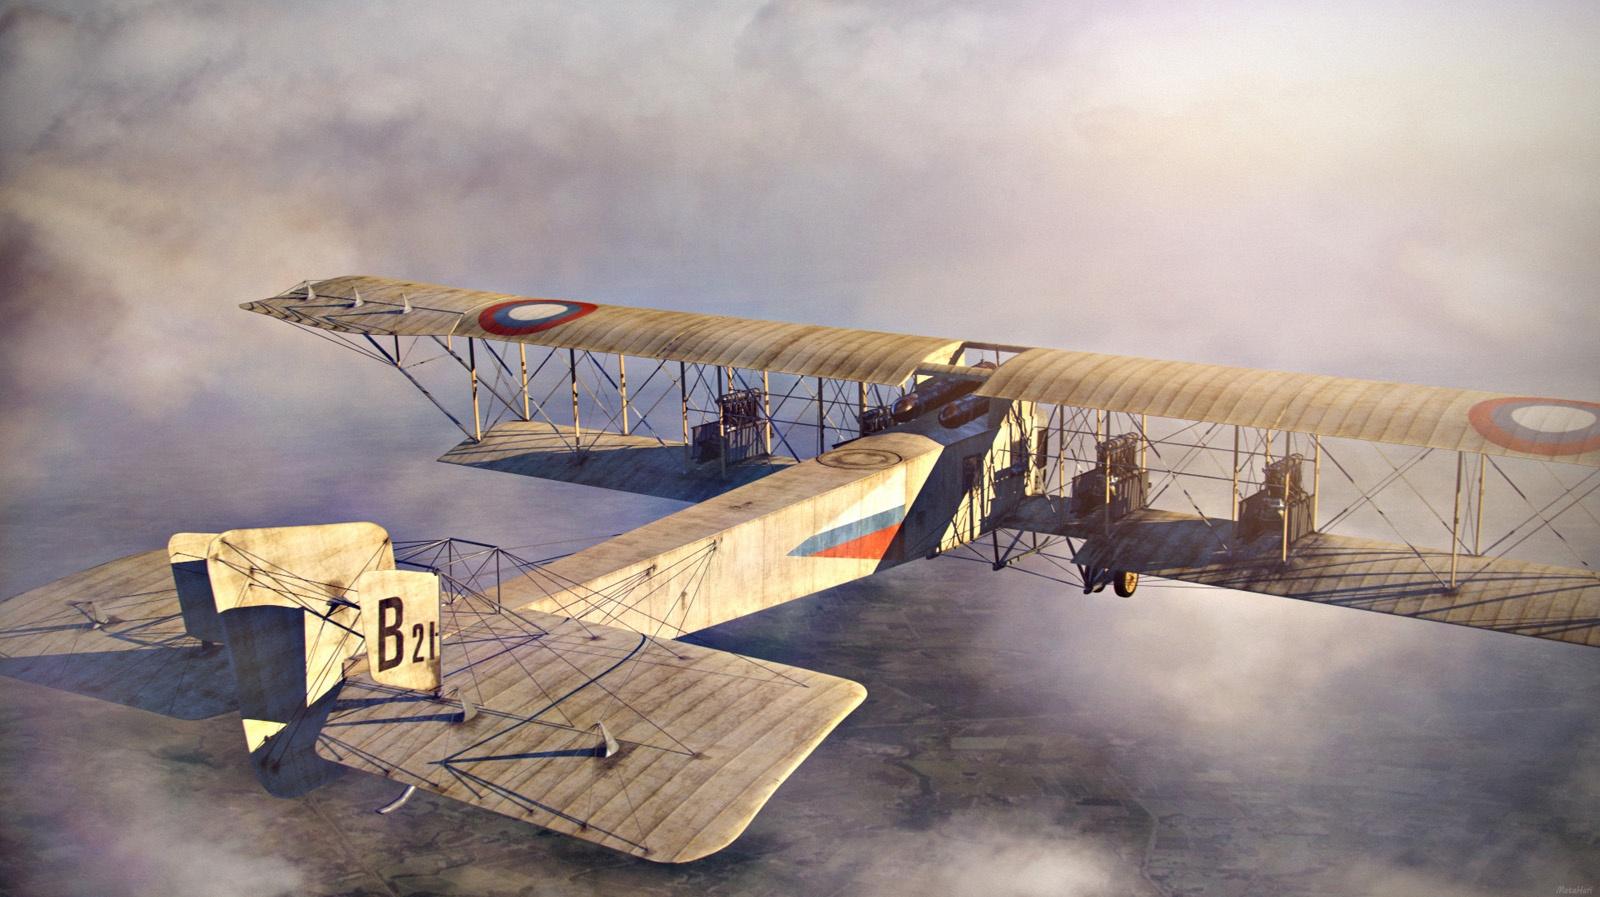 Aircraft by Yuri Marsakov